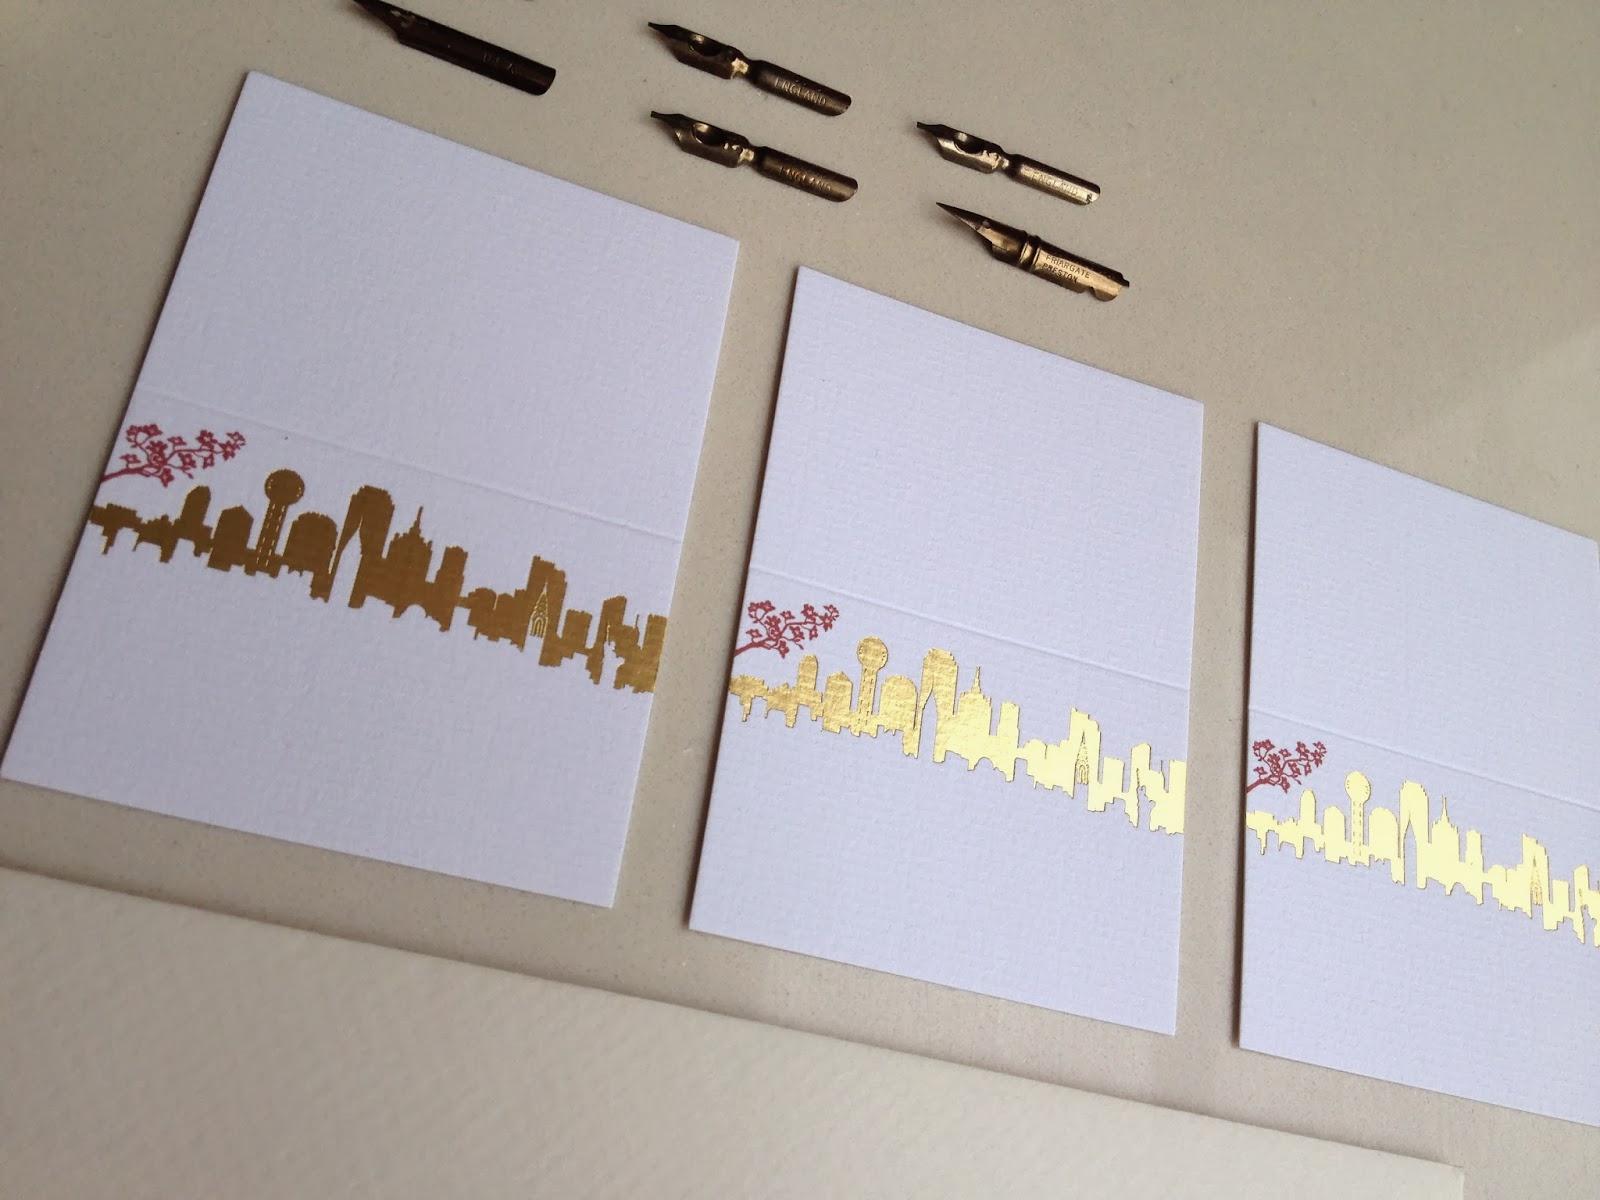 New Wedding Invitation Designs: Kalo Make Art Bespoke Wedding Invitation Designs: December